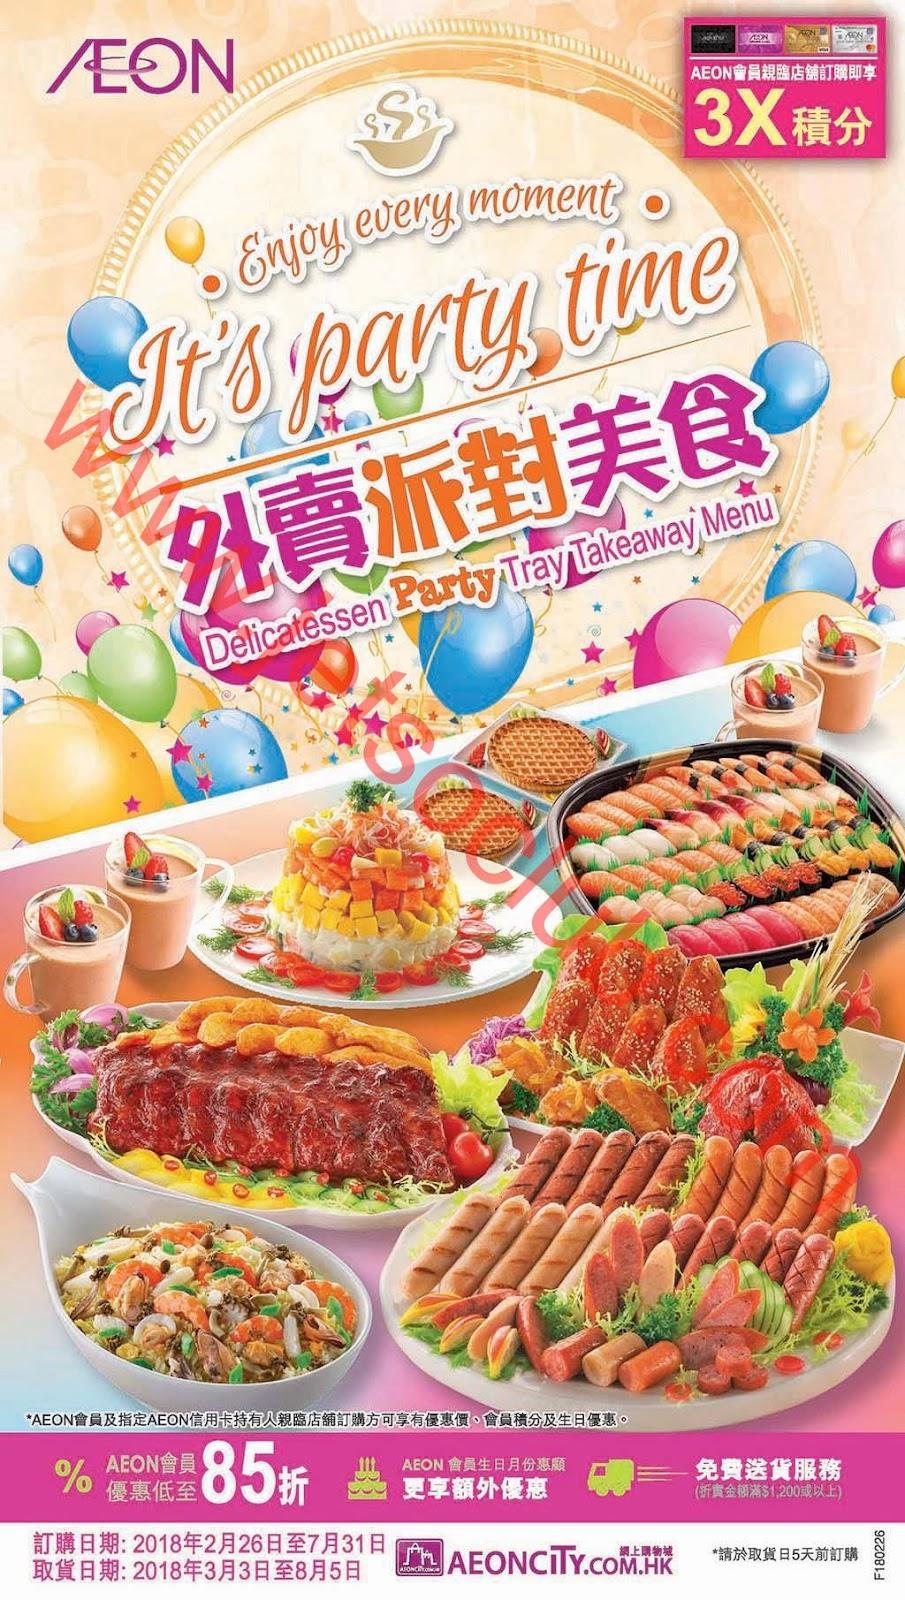 AEON:外賣派對美食(至31/7) ( Jetso Club 著數俱樂部 )